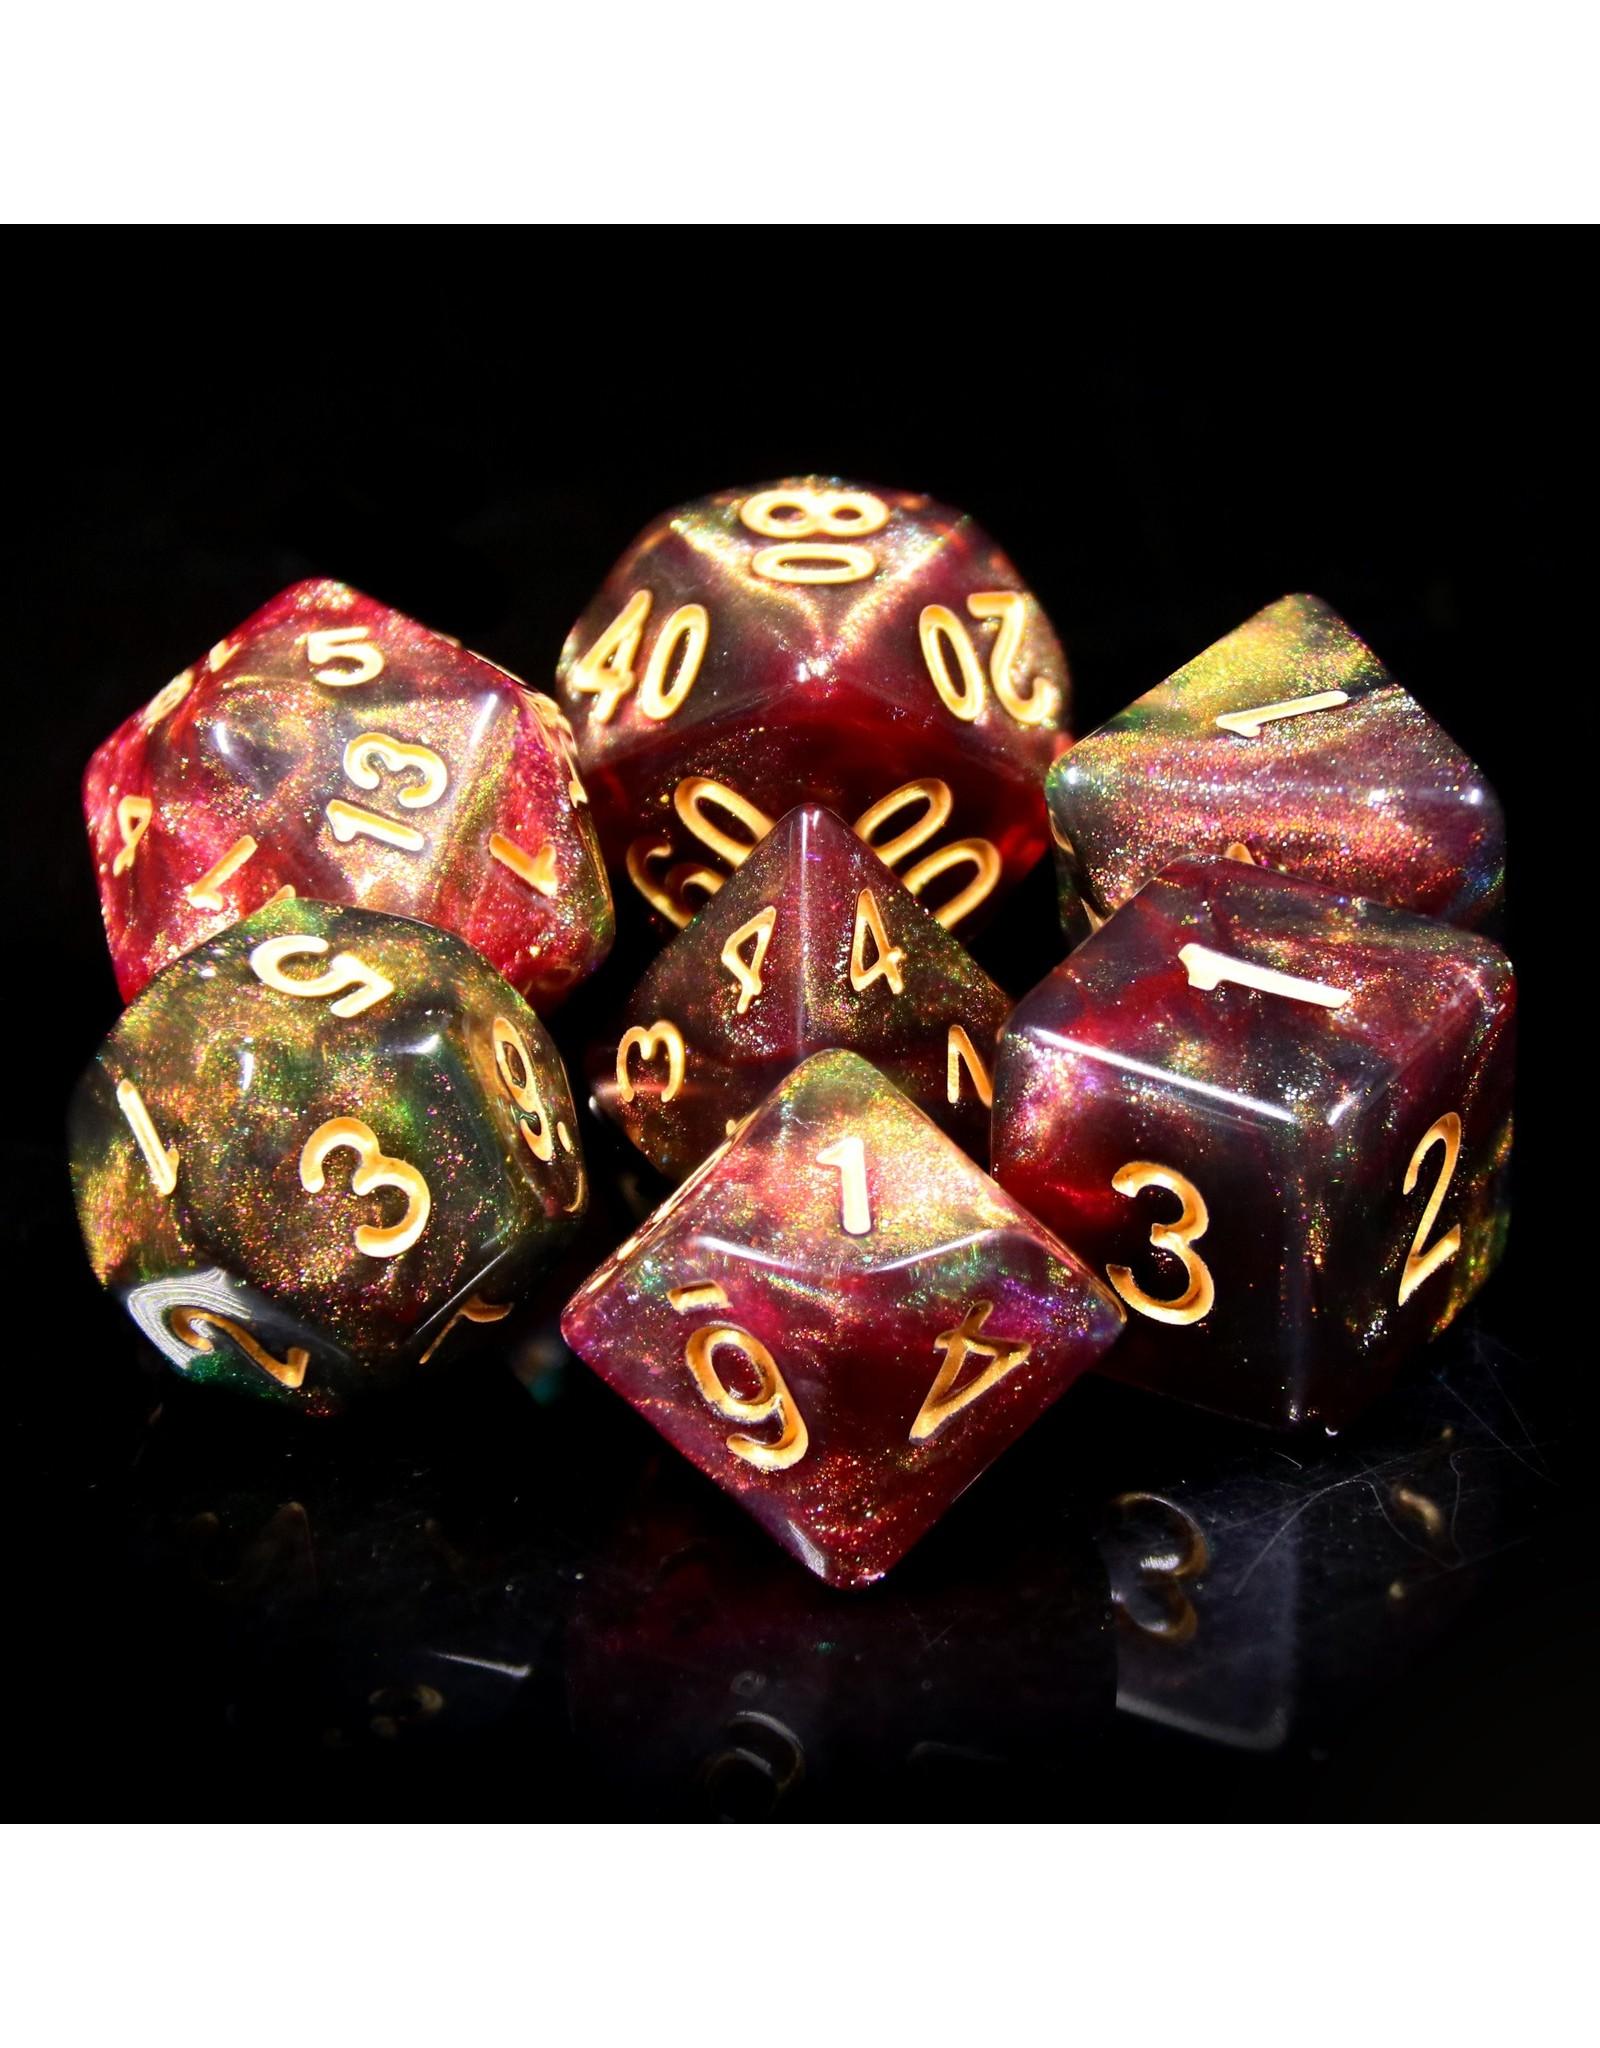 HengDa Dice 7PC RPG DICE - MIDNIGHT ROSE